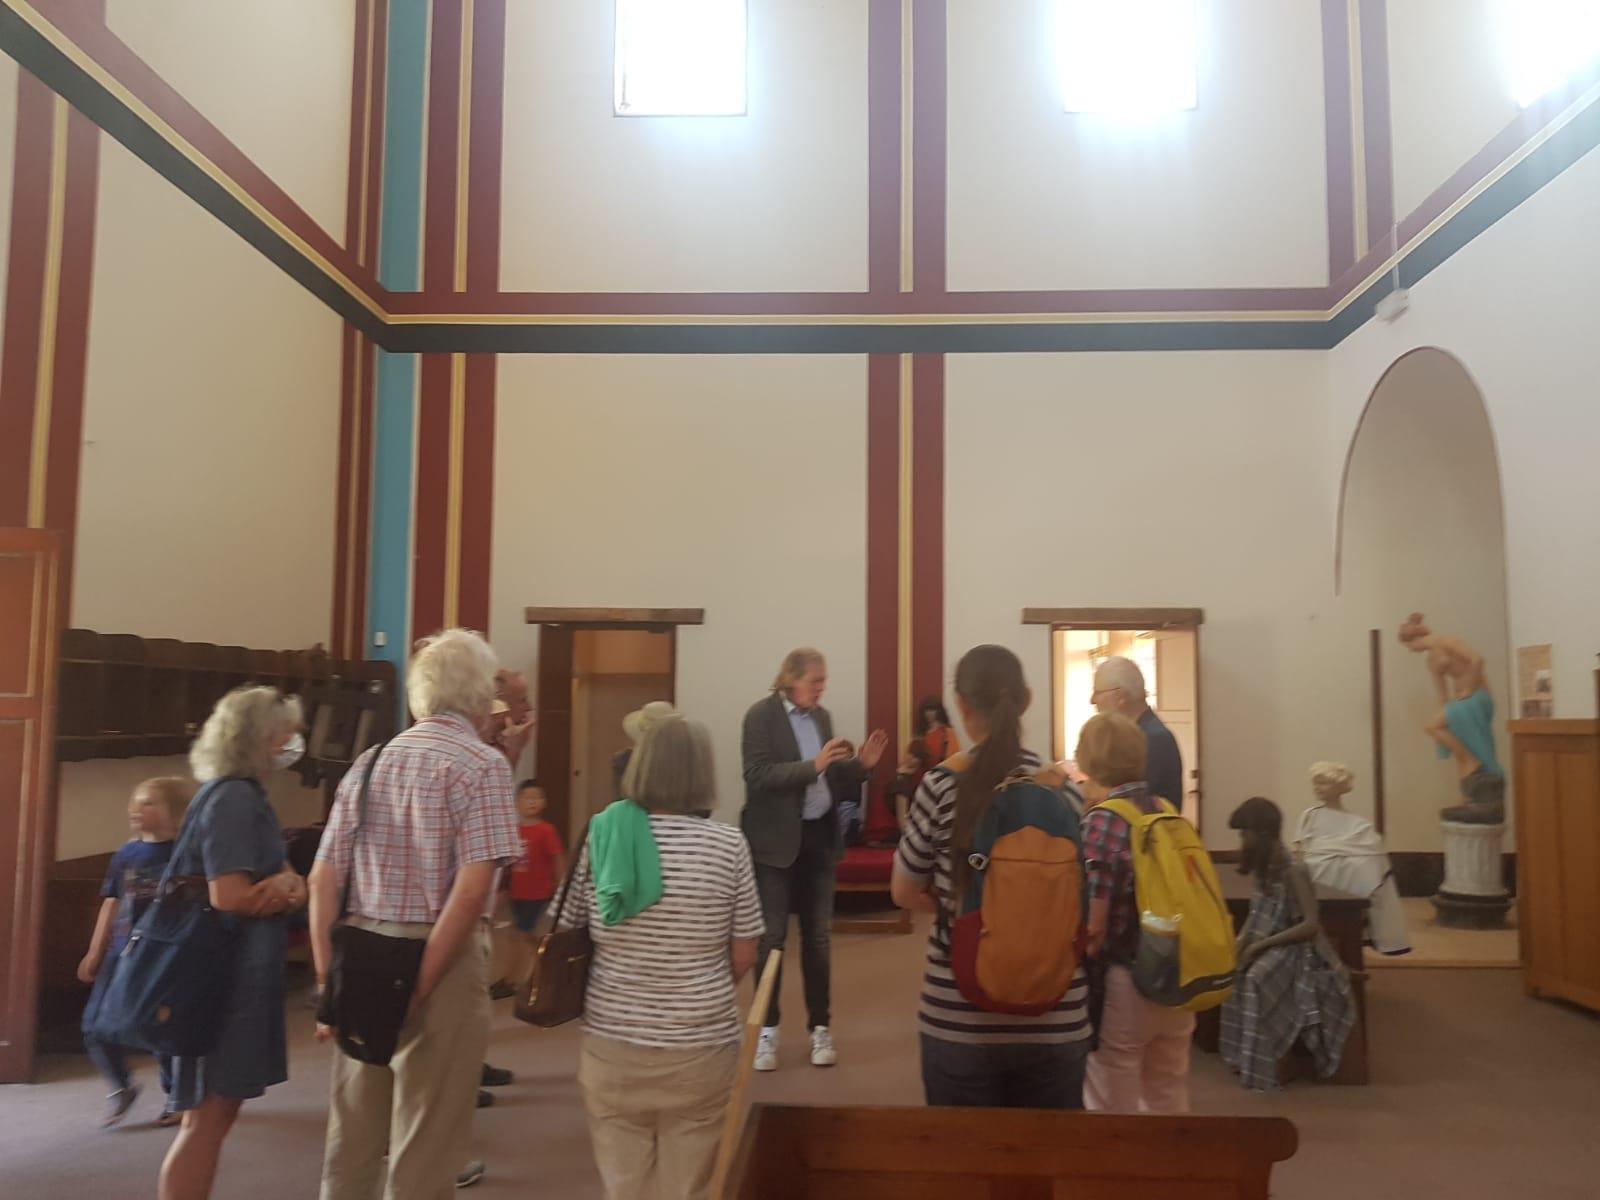 20170717_Historizon_Museumpark Archeon_uitleg in Romeins badhuis.JPG